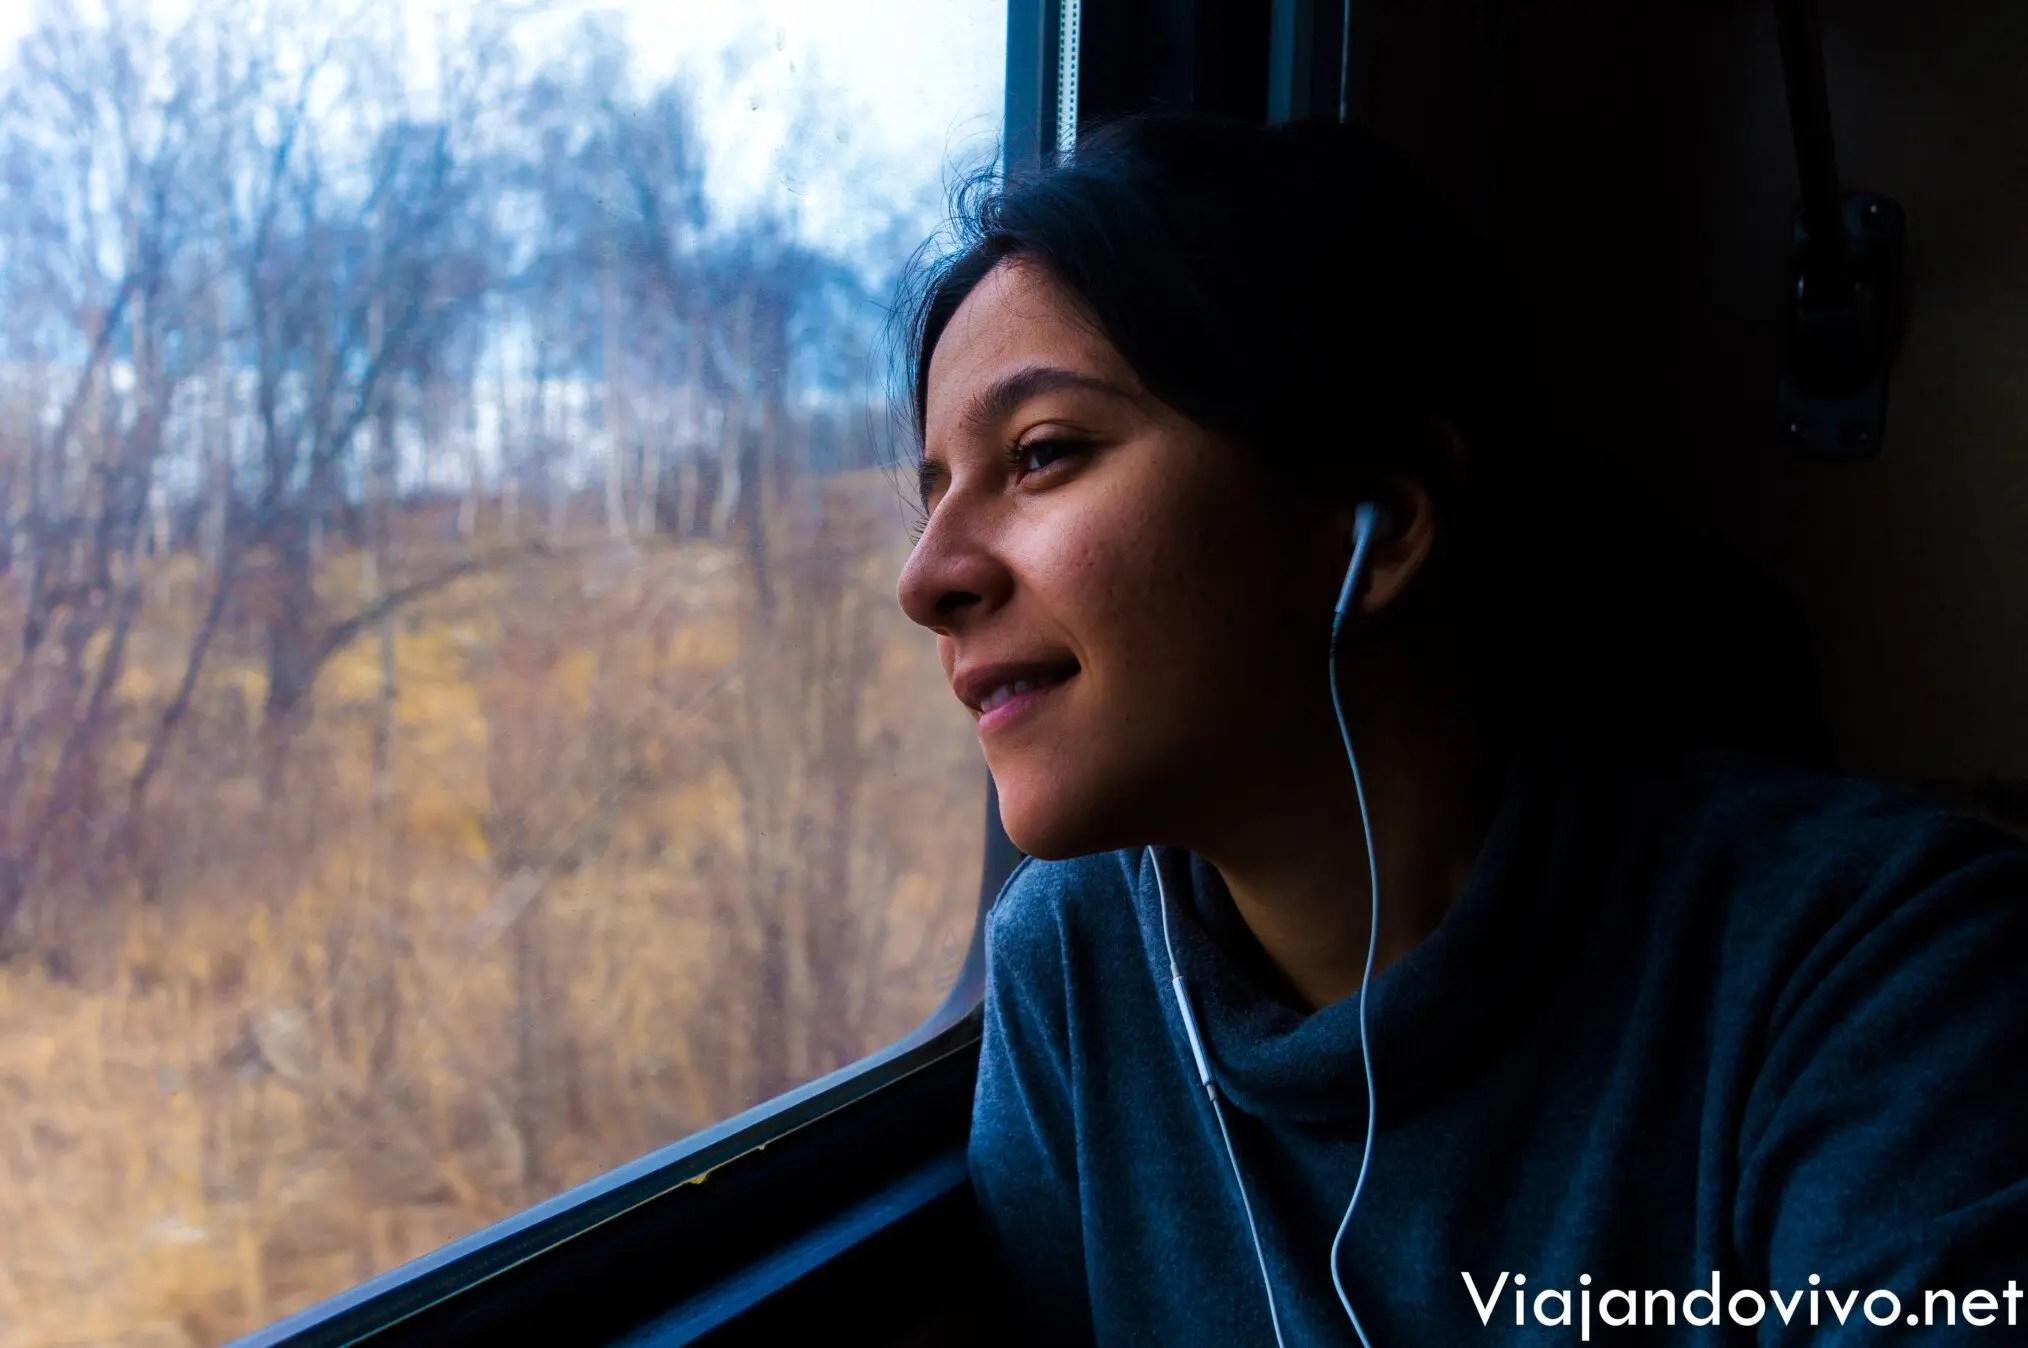 Celeste mirando por la ventana del Tren Transiberiano